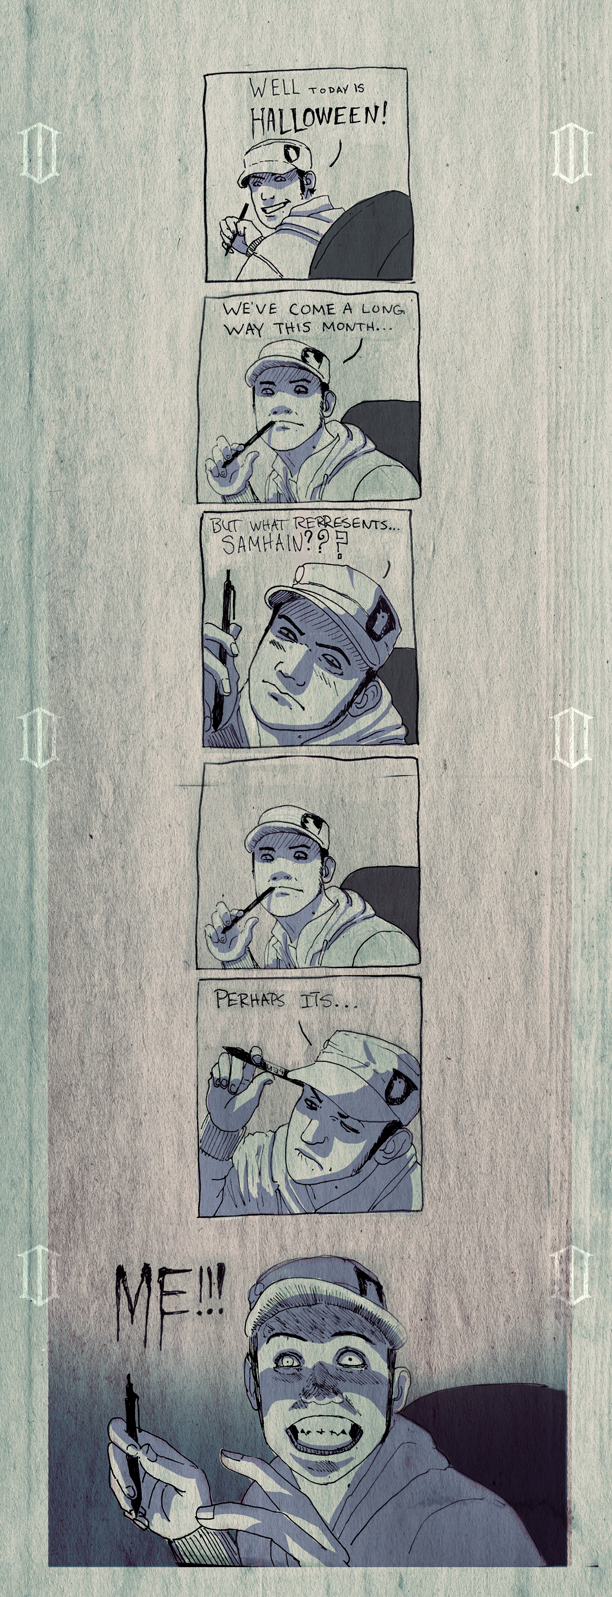 31stcomic1.png